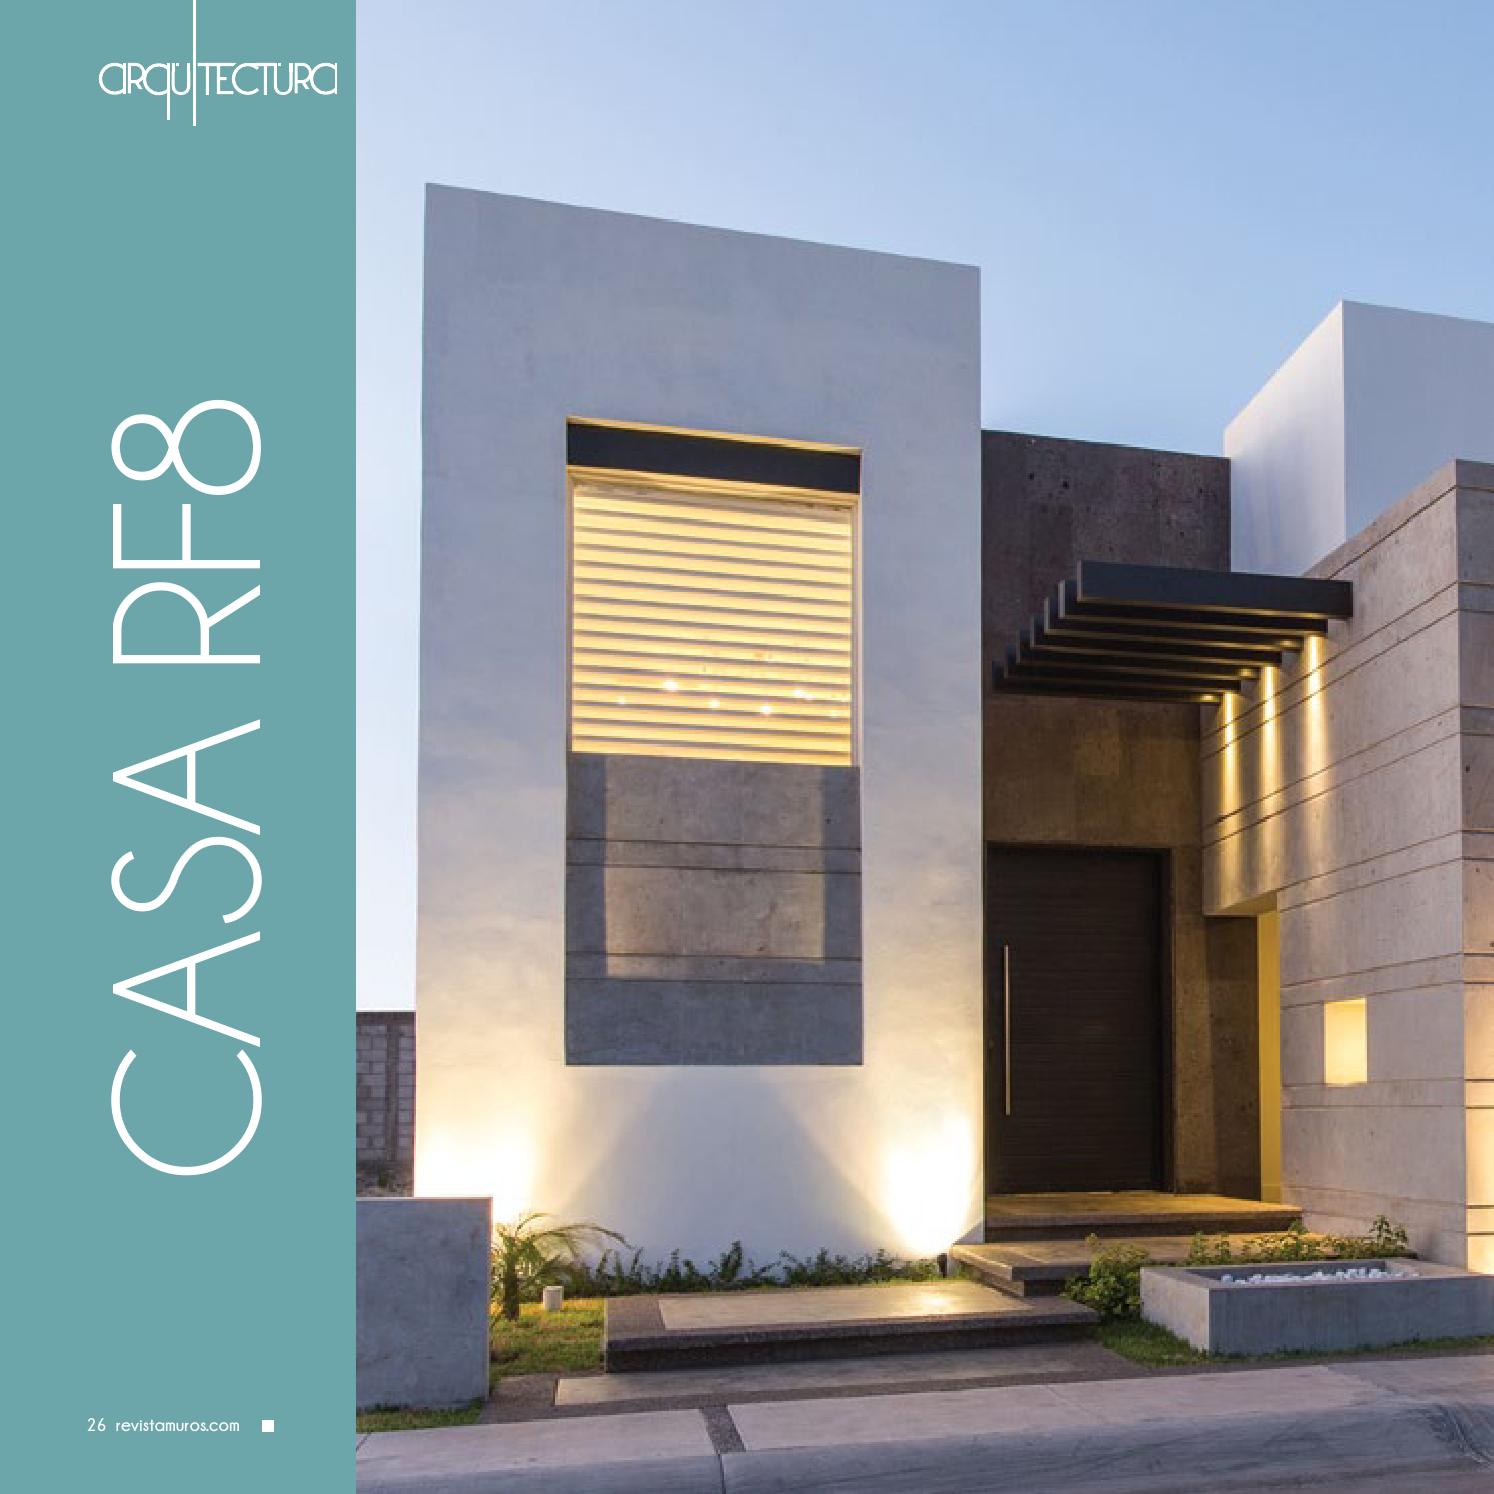 Edici n 17 revista muros arquitectura dise o for Arte arquitectura y diseno definicion